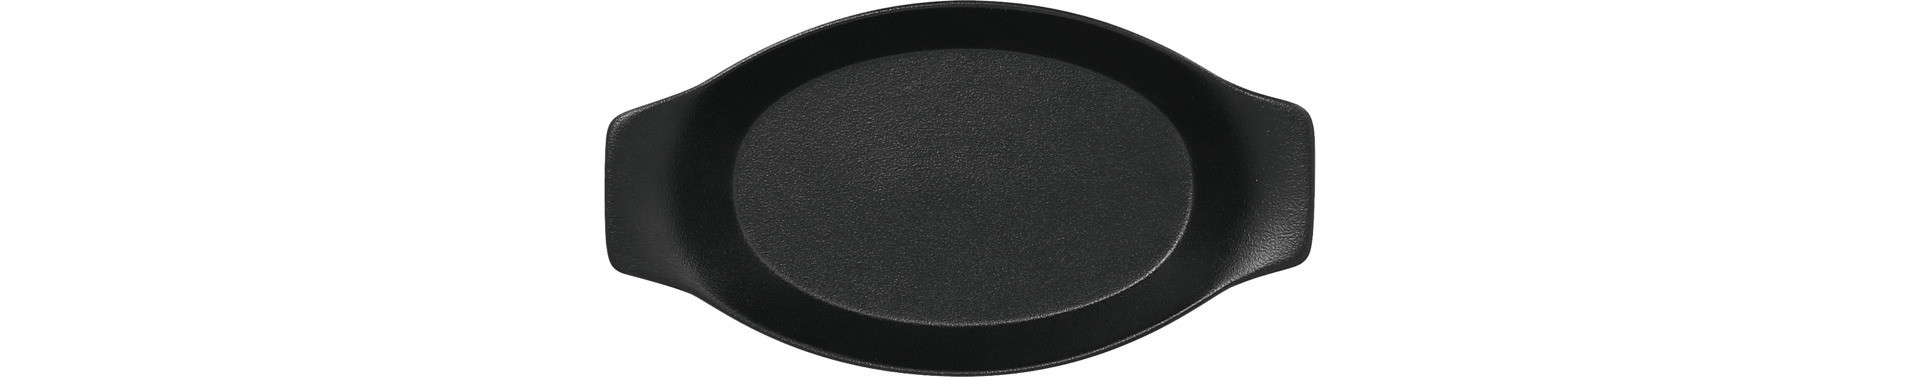 Neofusion, Schale oval mit Griffen 200 x 110 mm / 0,20 l volcano